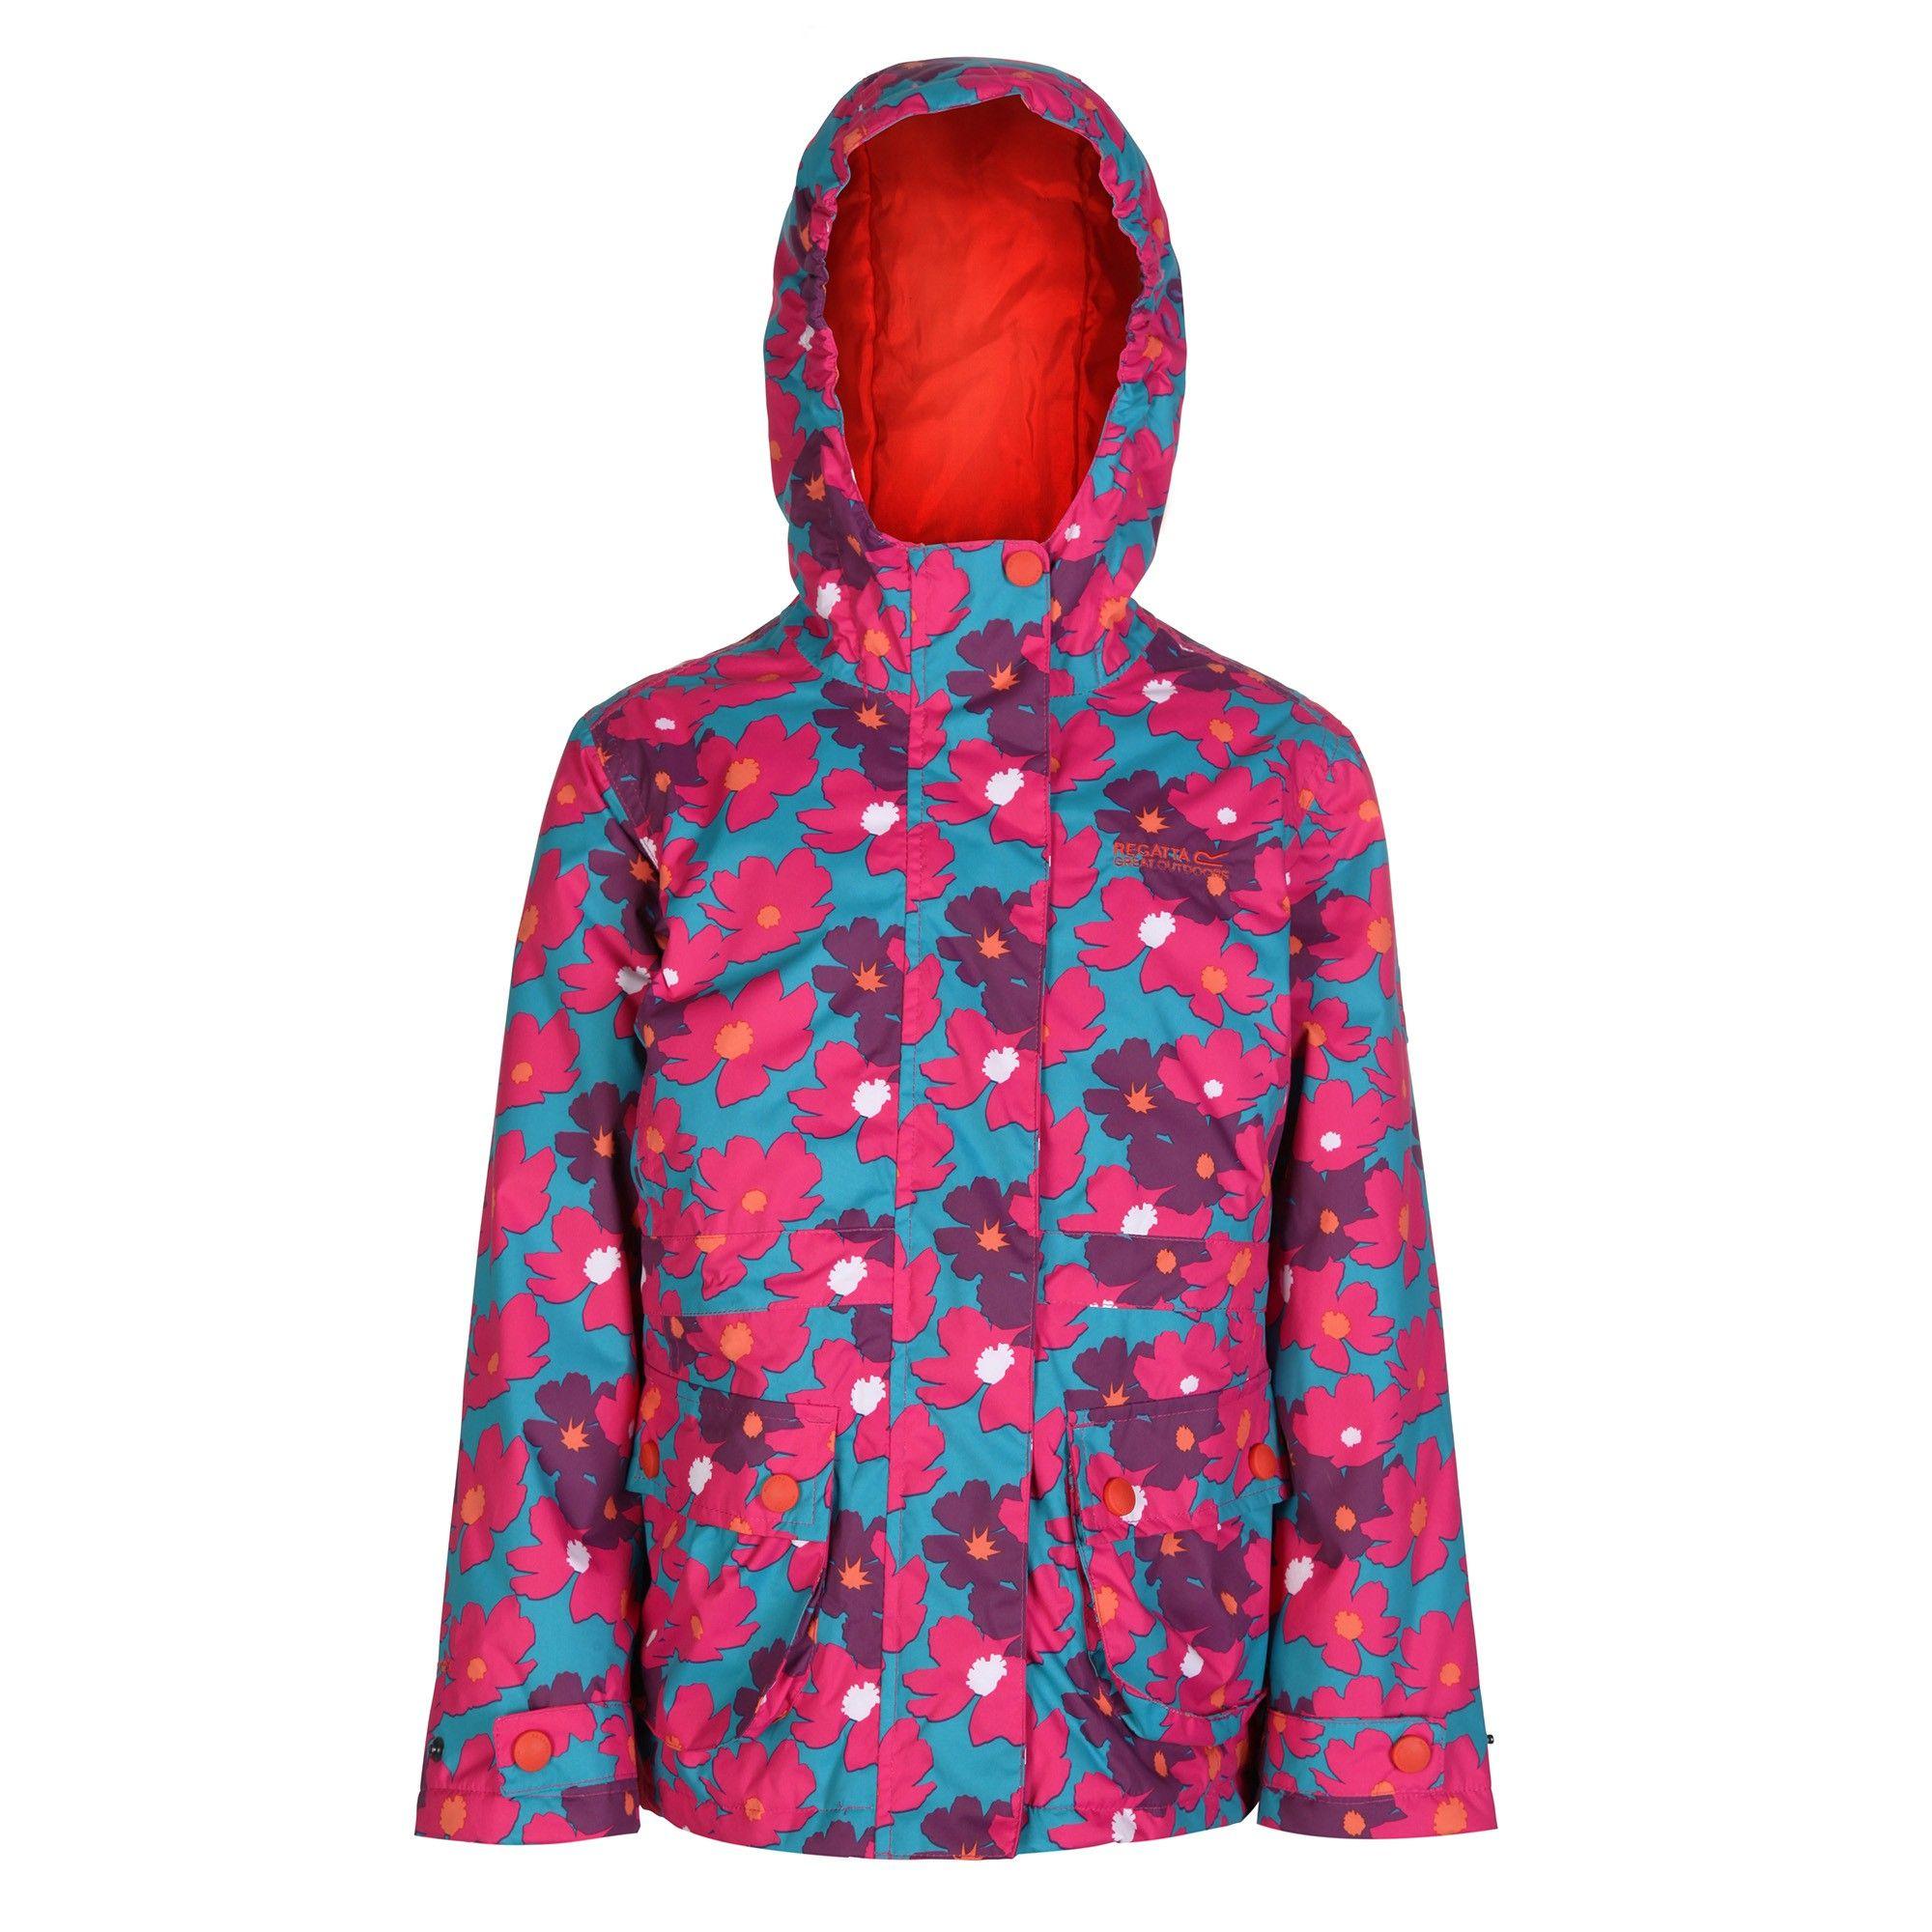 Regatta Great Outdoors Childrens Girls Bouncy Waterproof Jacket